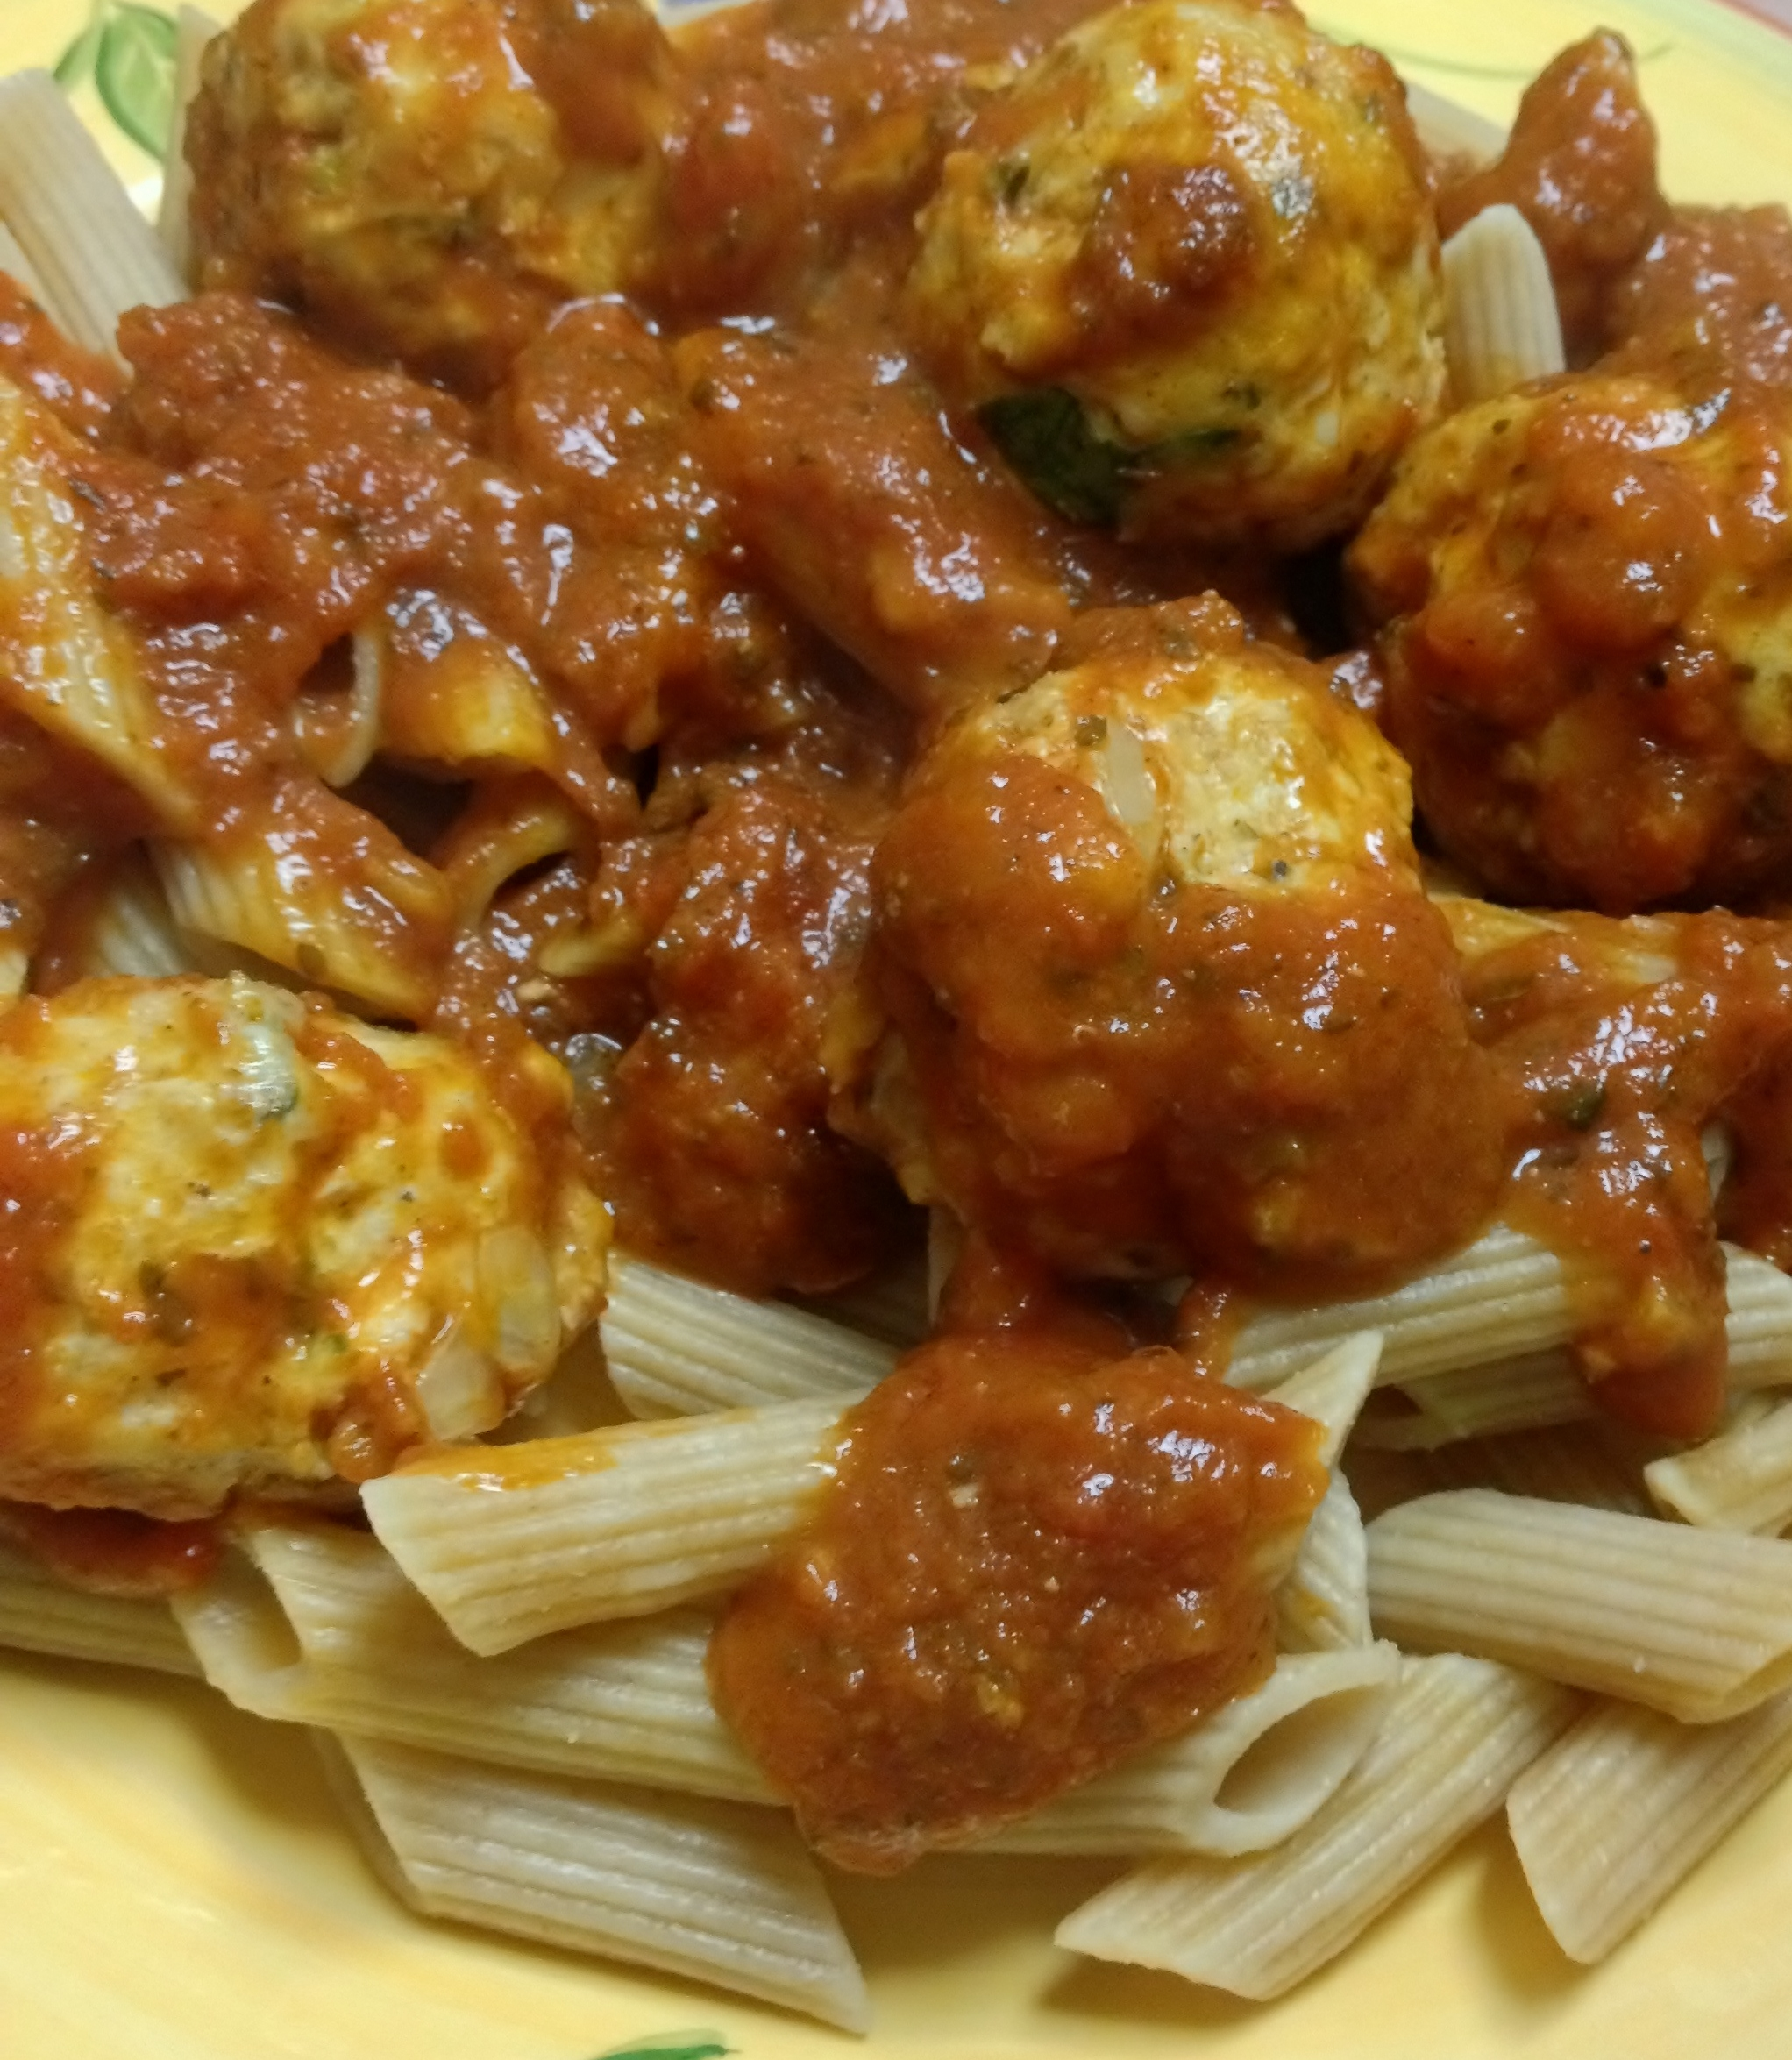 Sweet & Spicy Greek Turkey Meatballs | Heather's Creative Concoctions